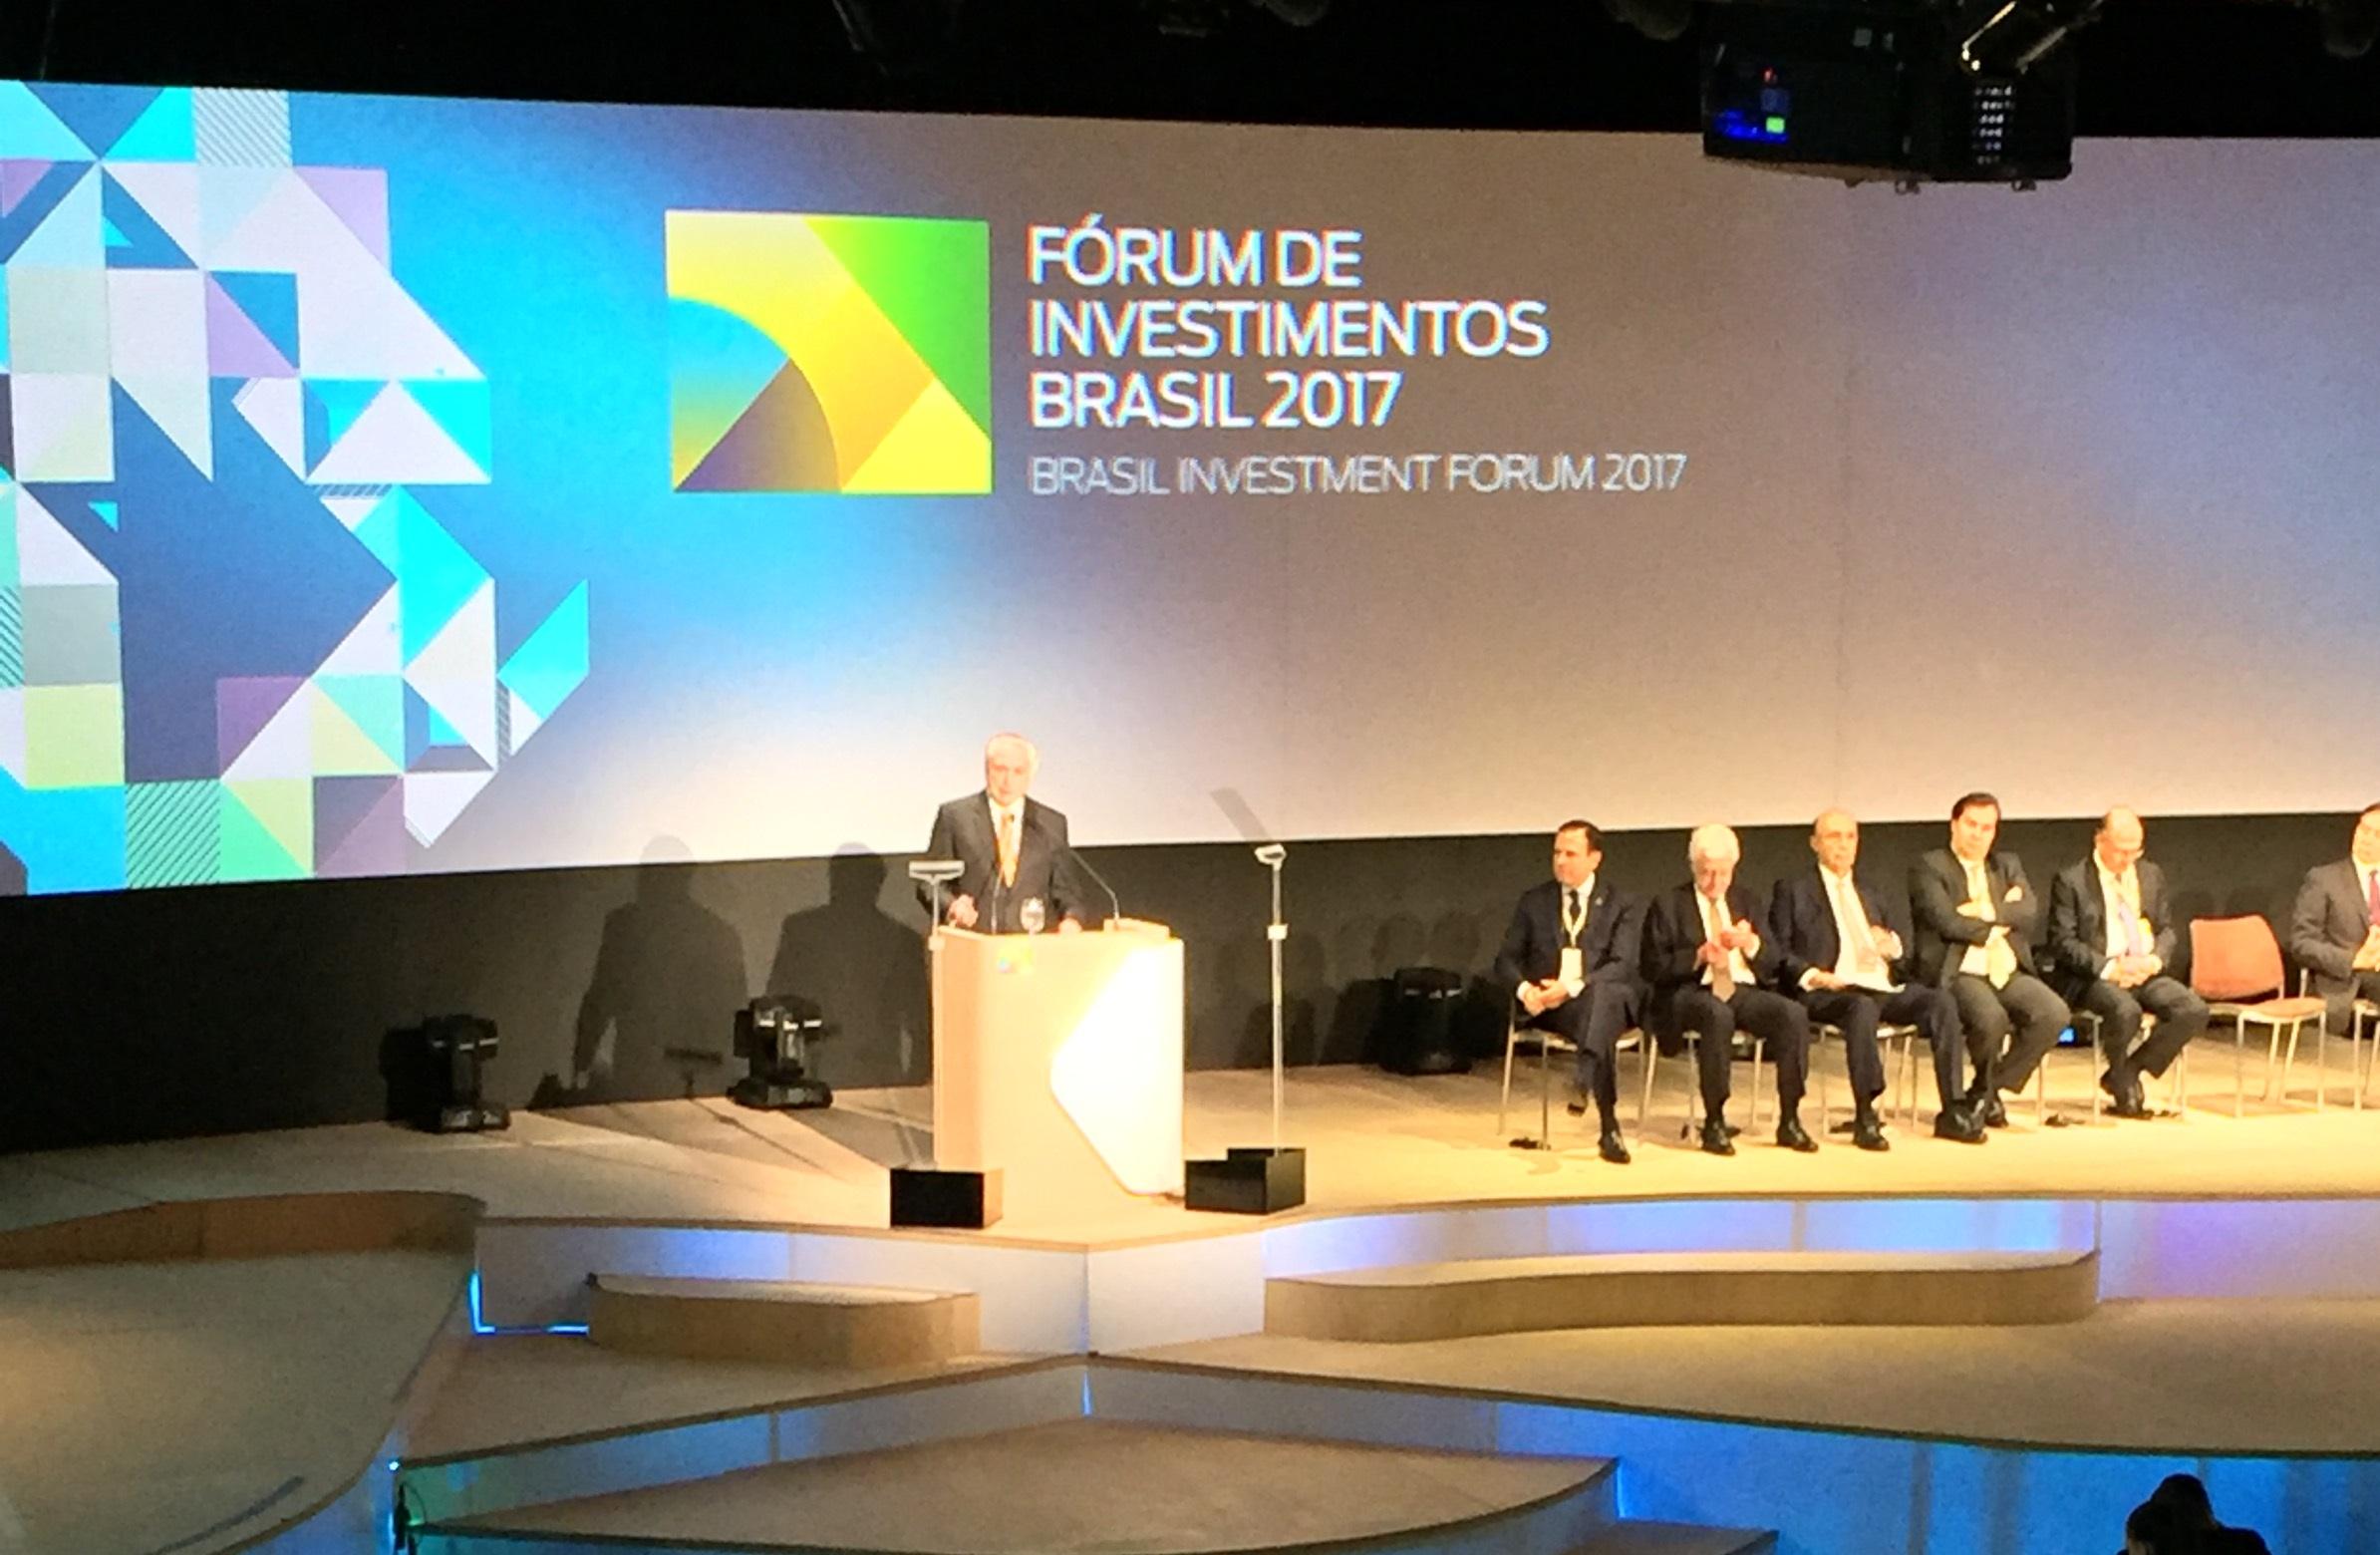 Brasil Investment Forum 2017